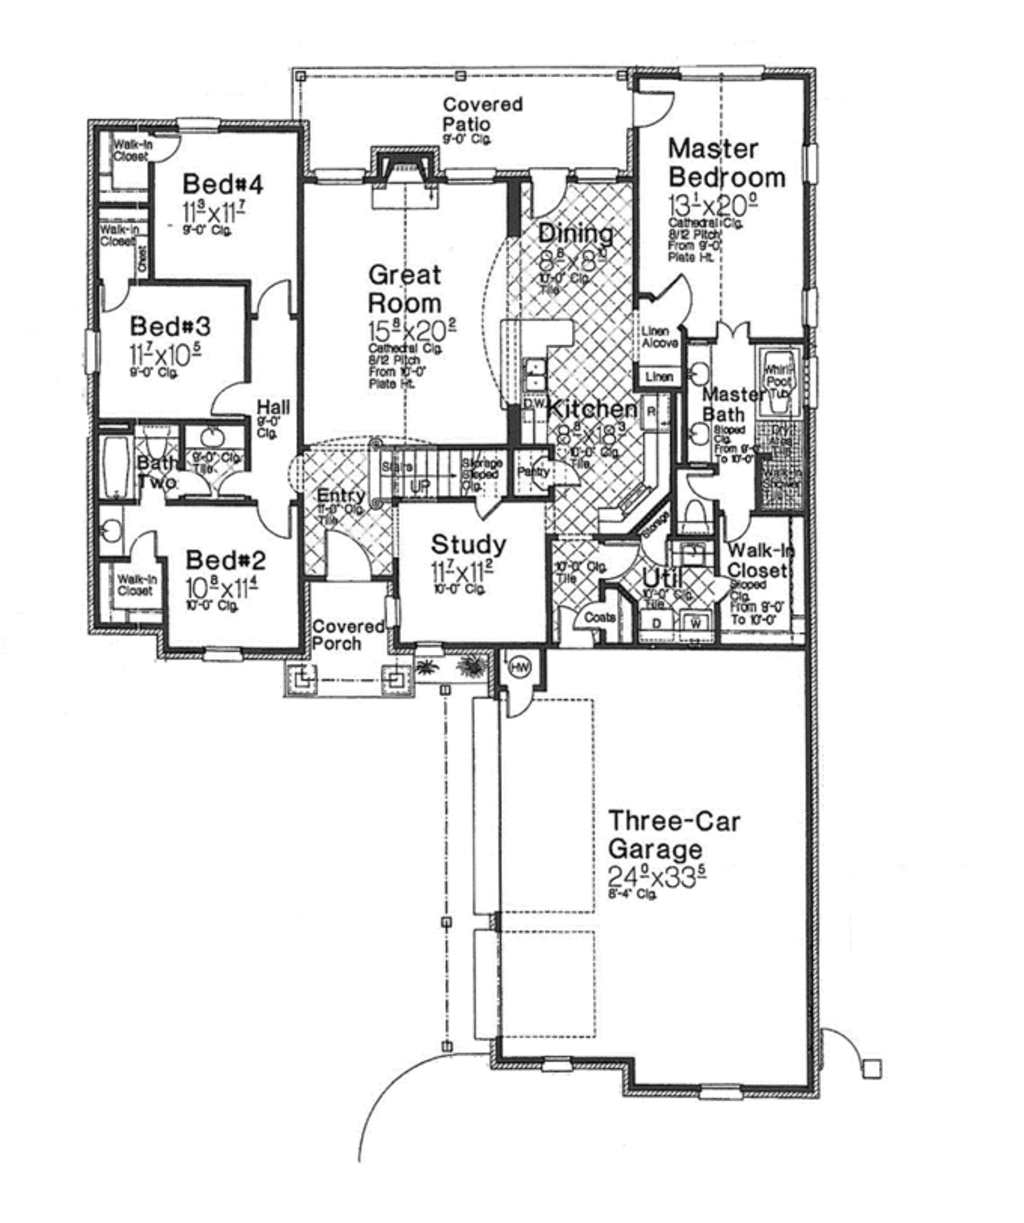 European Style House Plan 4 Beds 2 Baths 2130 Sq Ft Plan